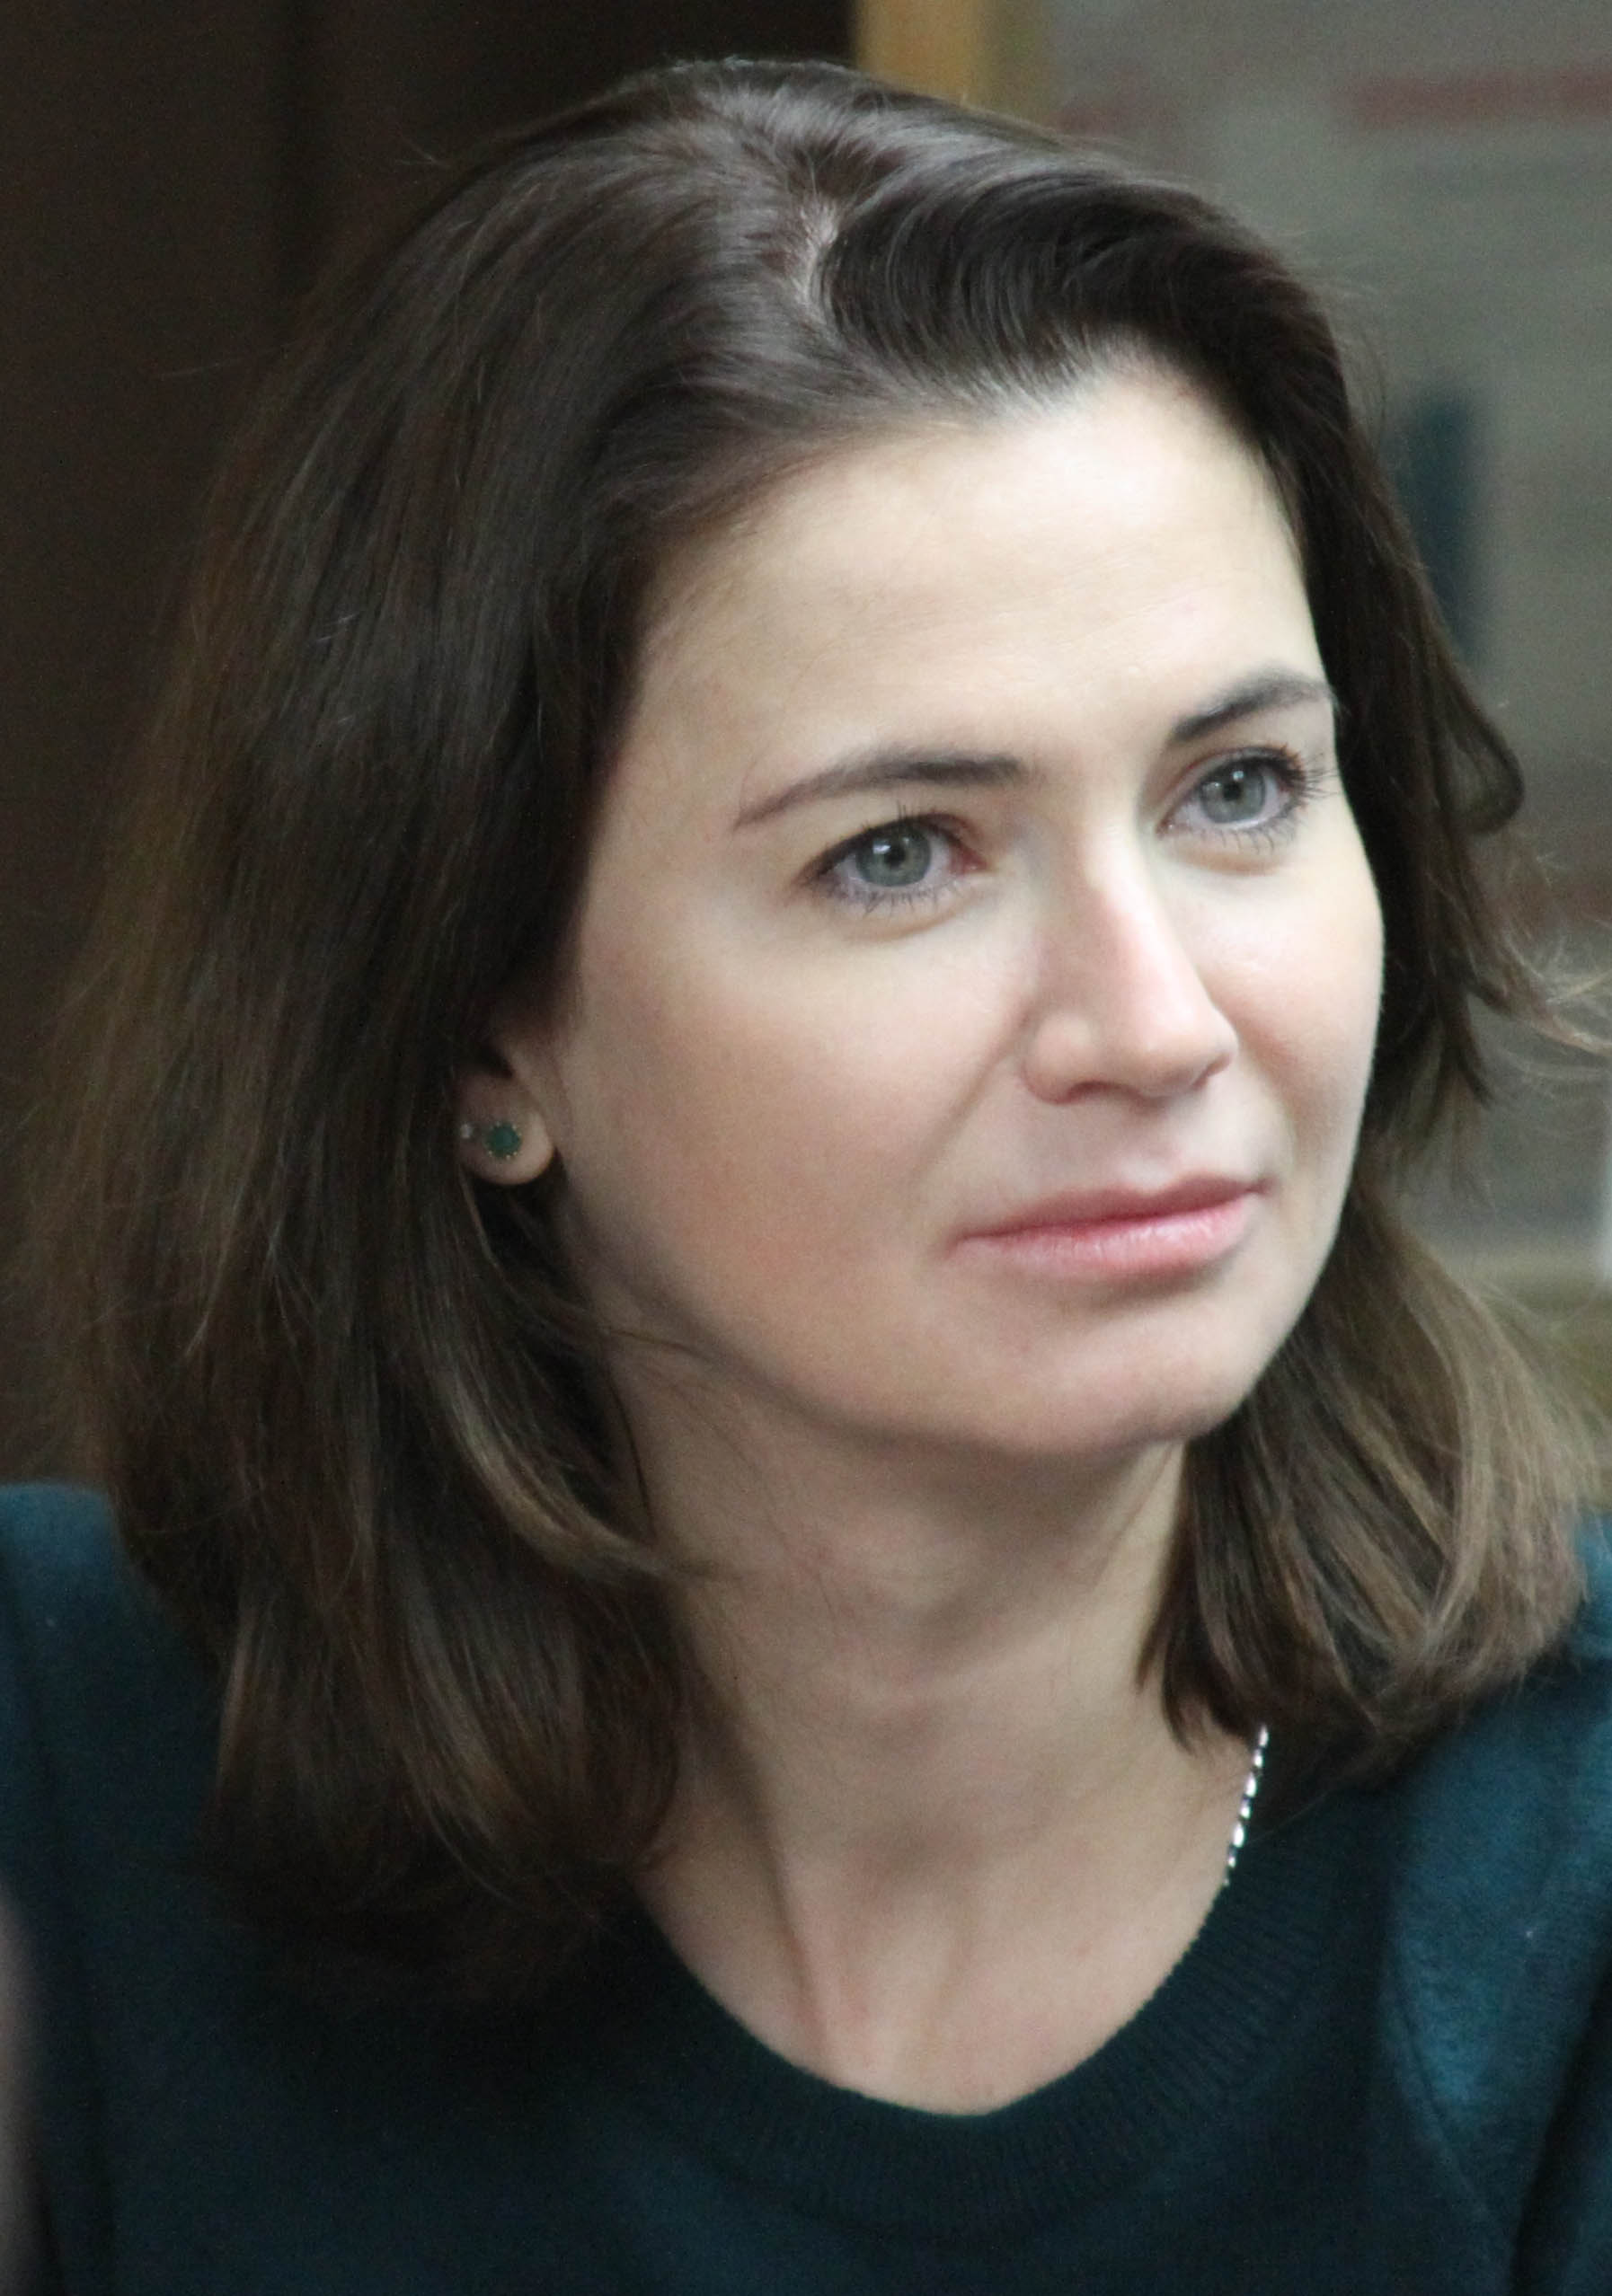 Ирина исаева актриса работа в вебчате ялтаоспаривается